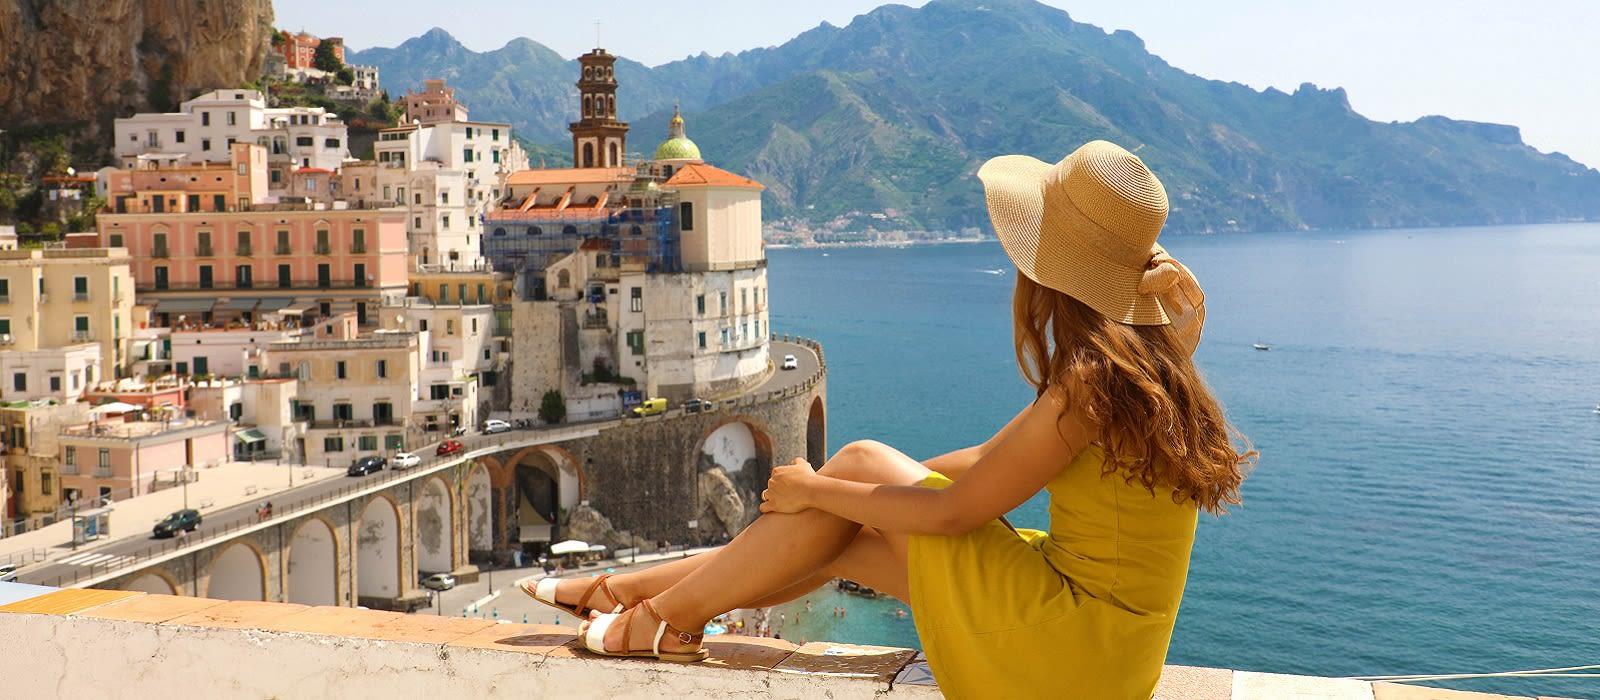 Best time to visit Italy - Amalfi Coast